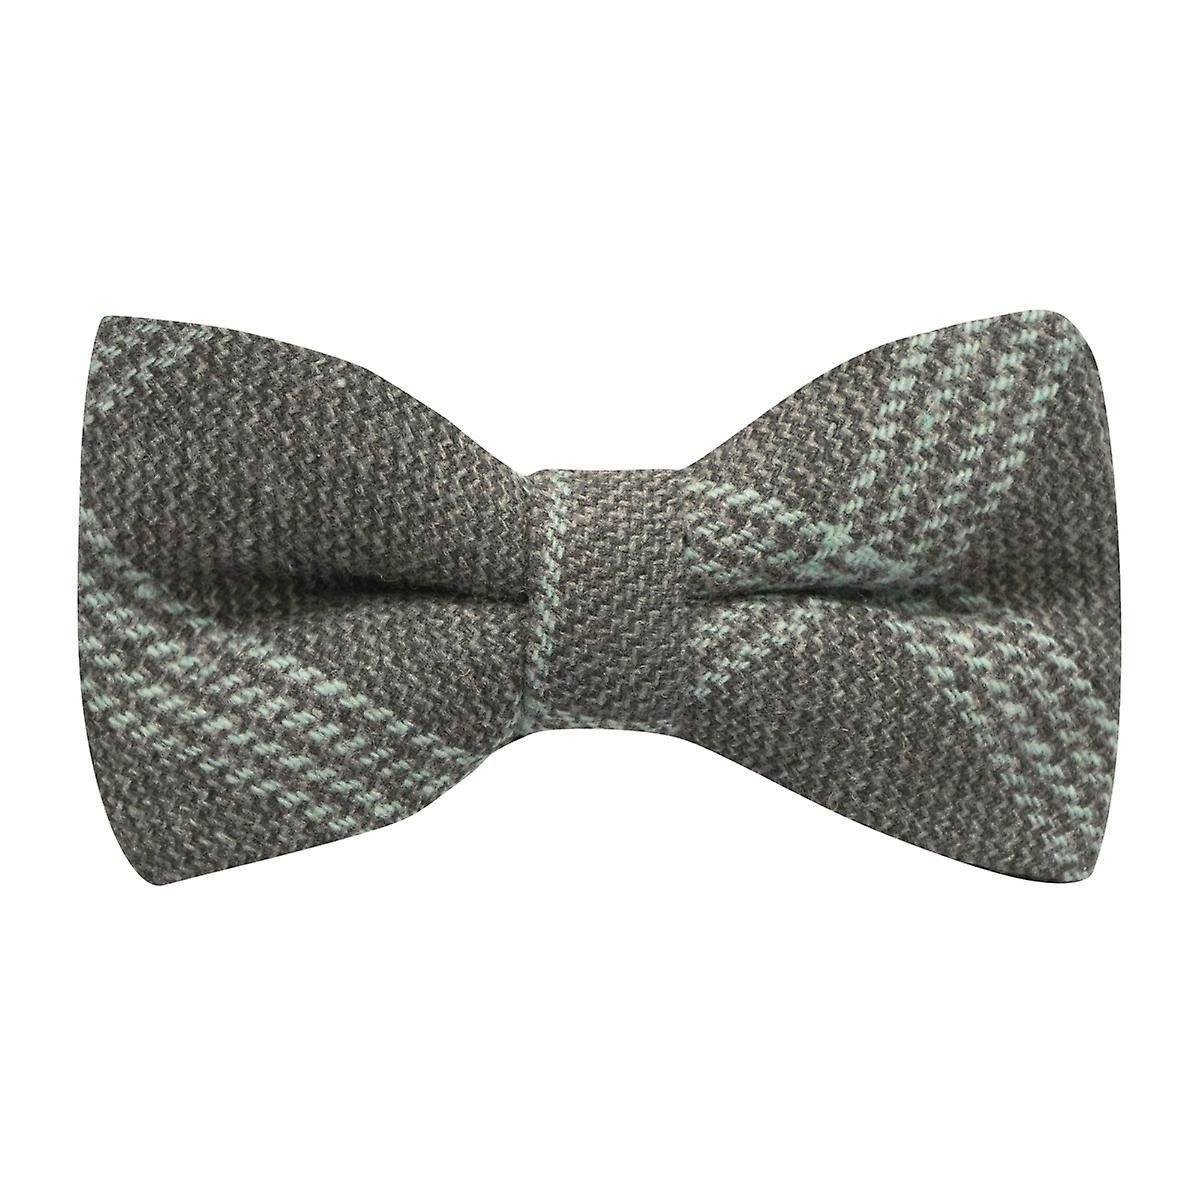 Slate Grey & Blue Birdseye Check Bow Tie